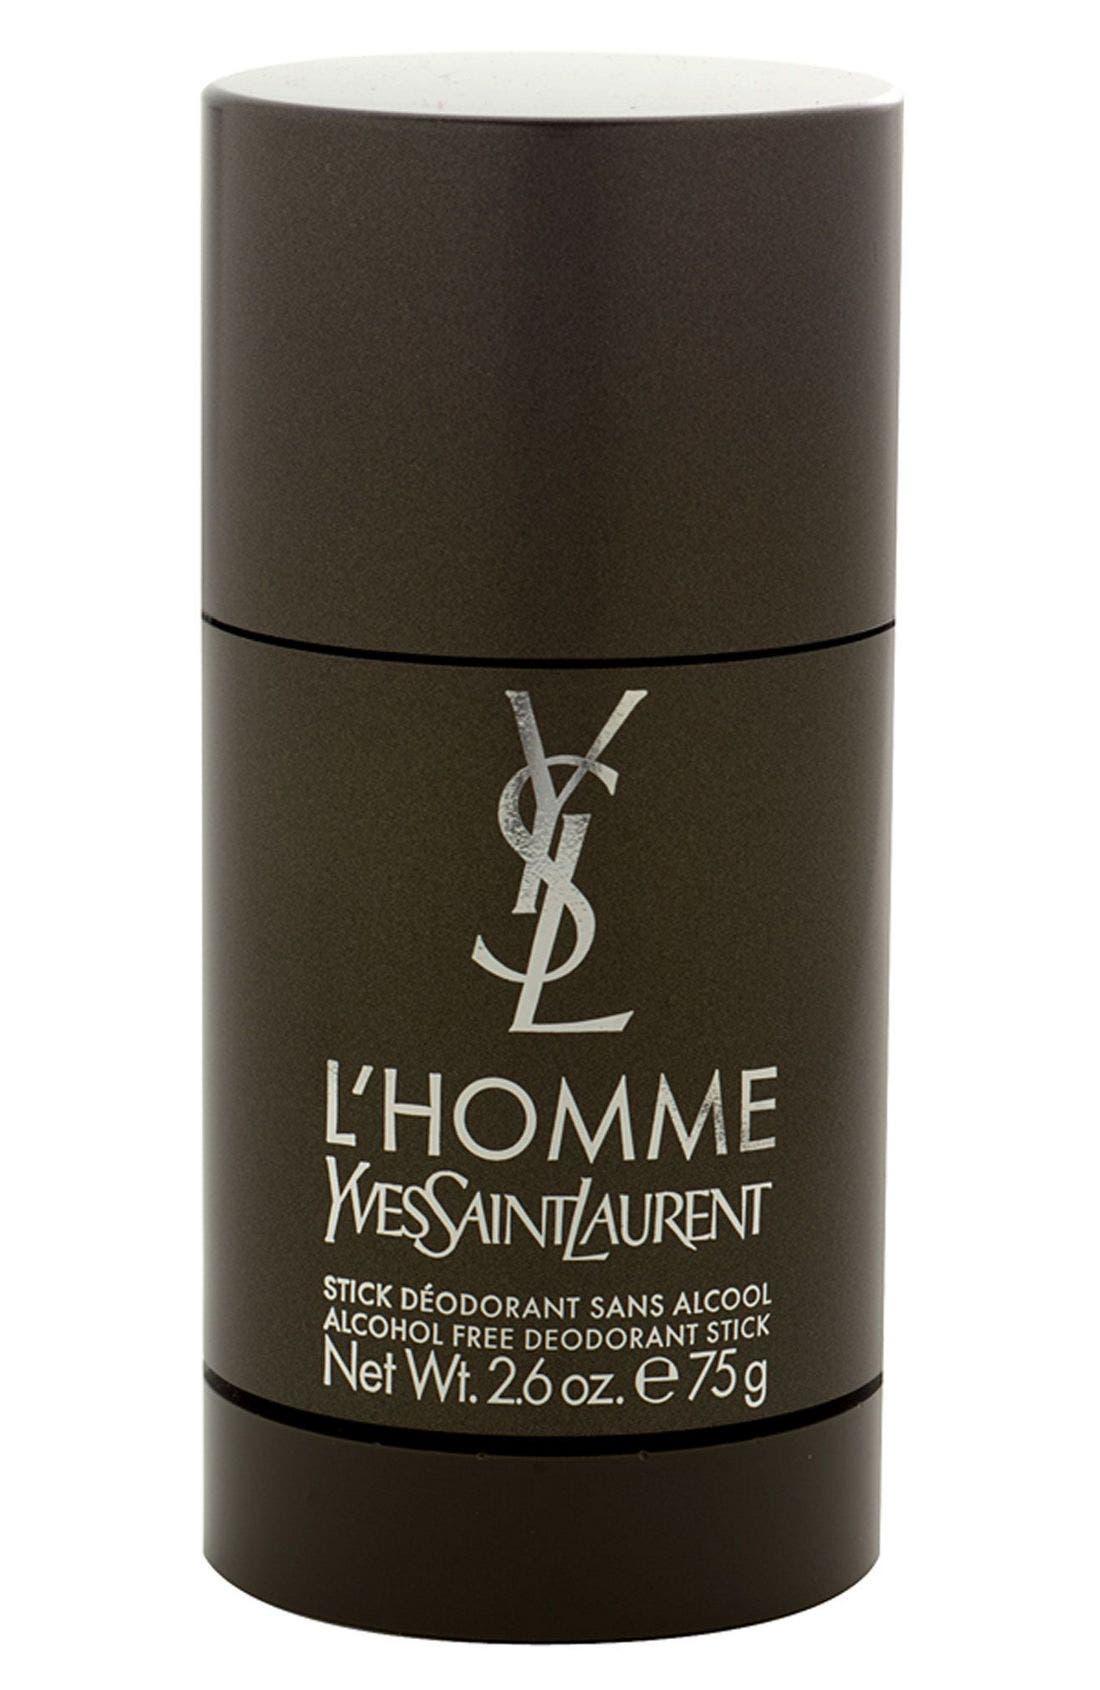 Yves Saint Laurent 'L'Homme' Alcohol Free Deodorant Stick